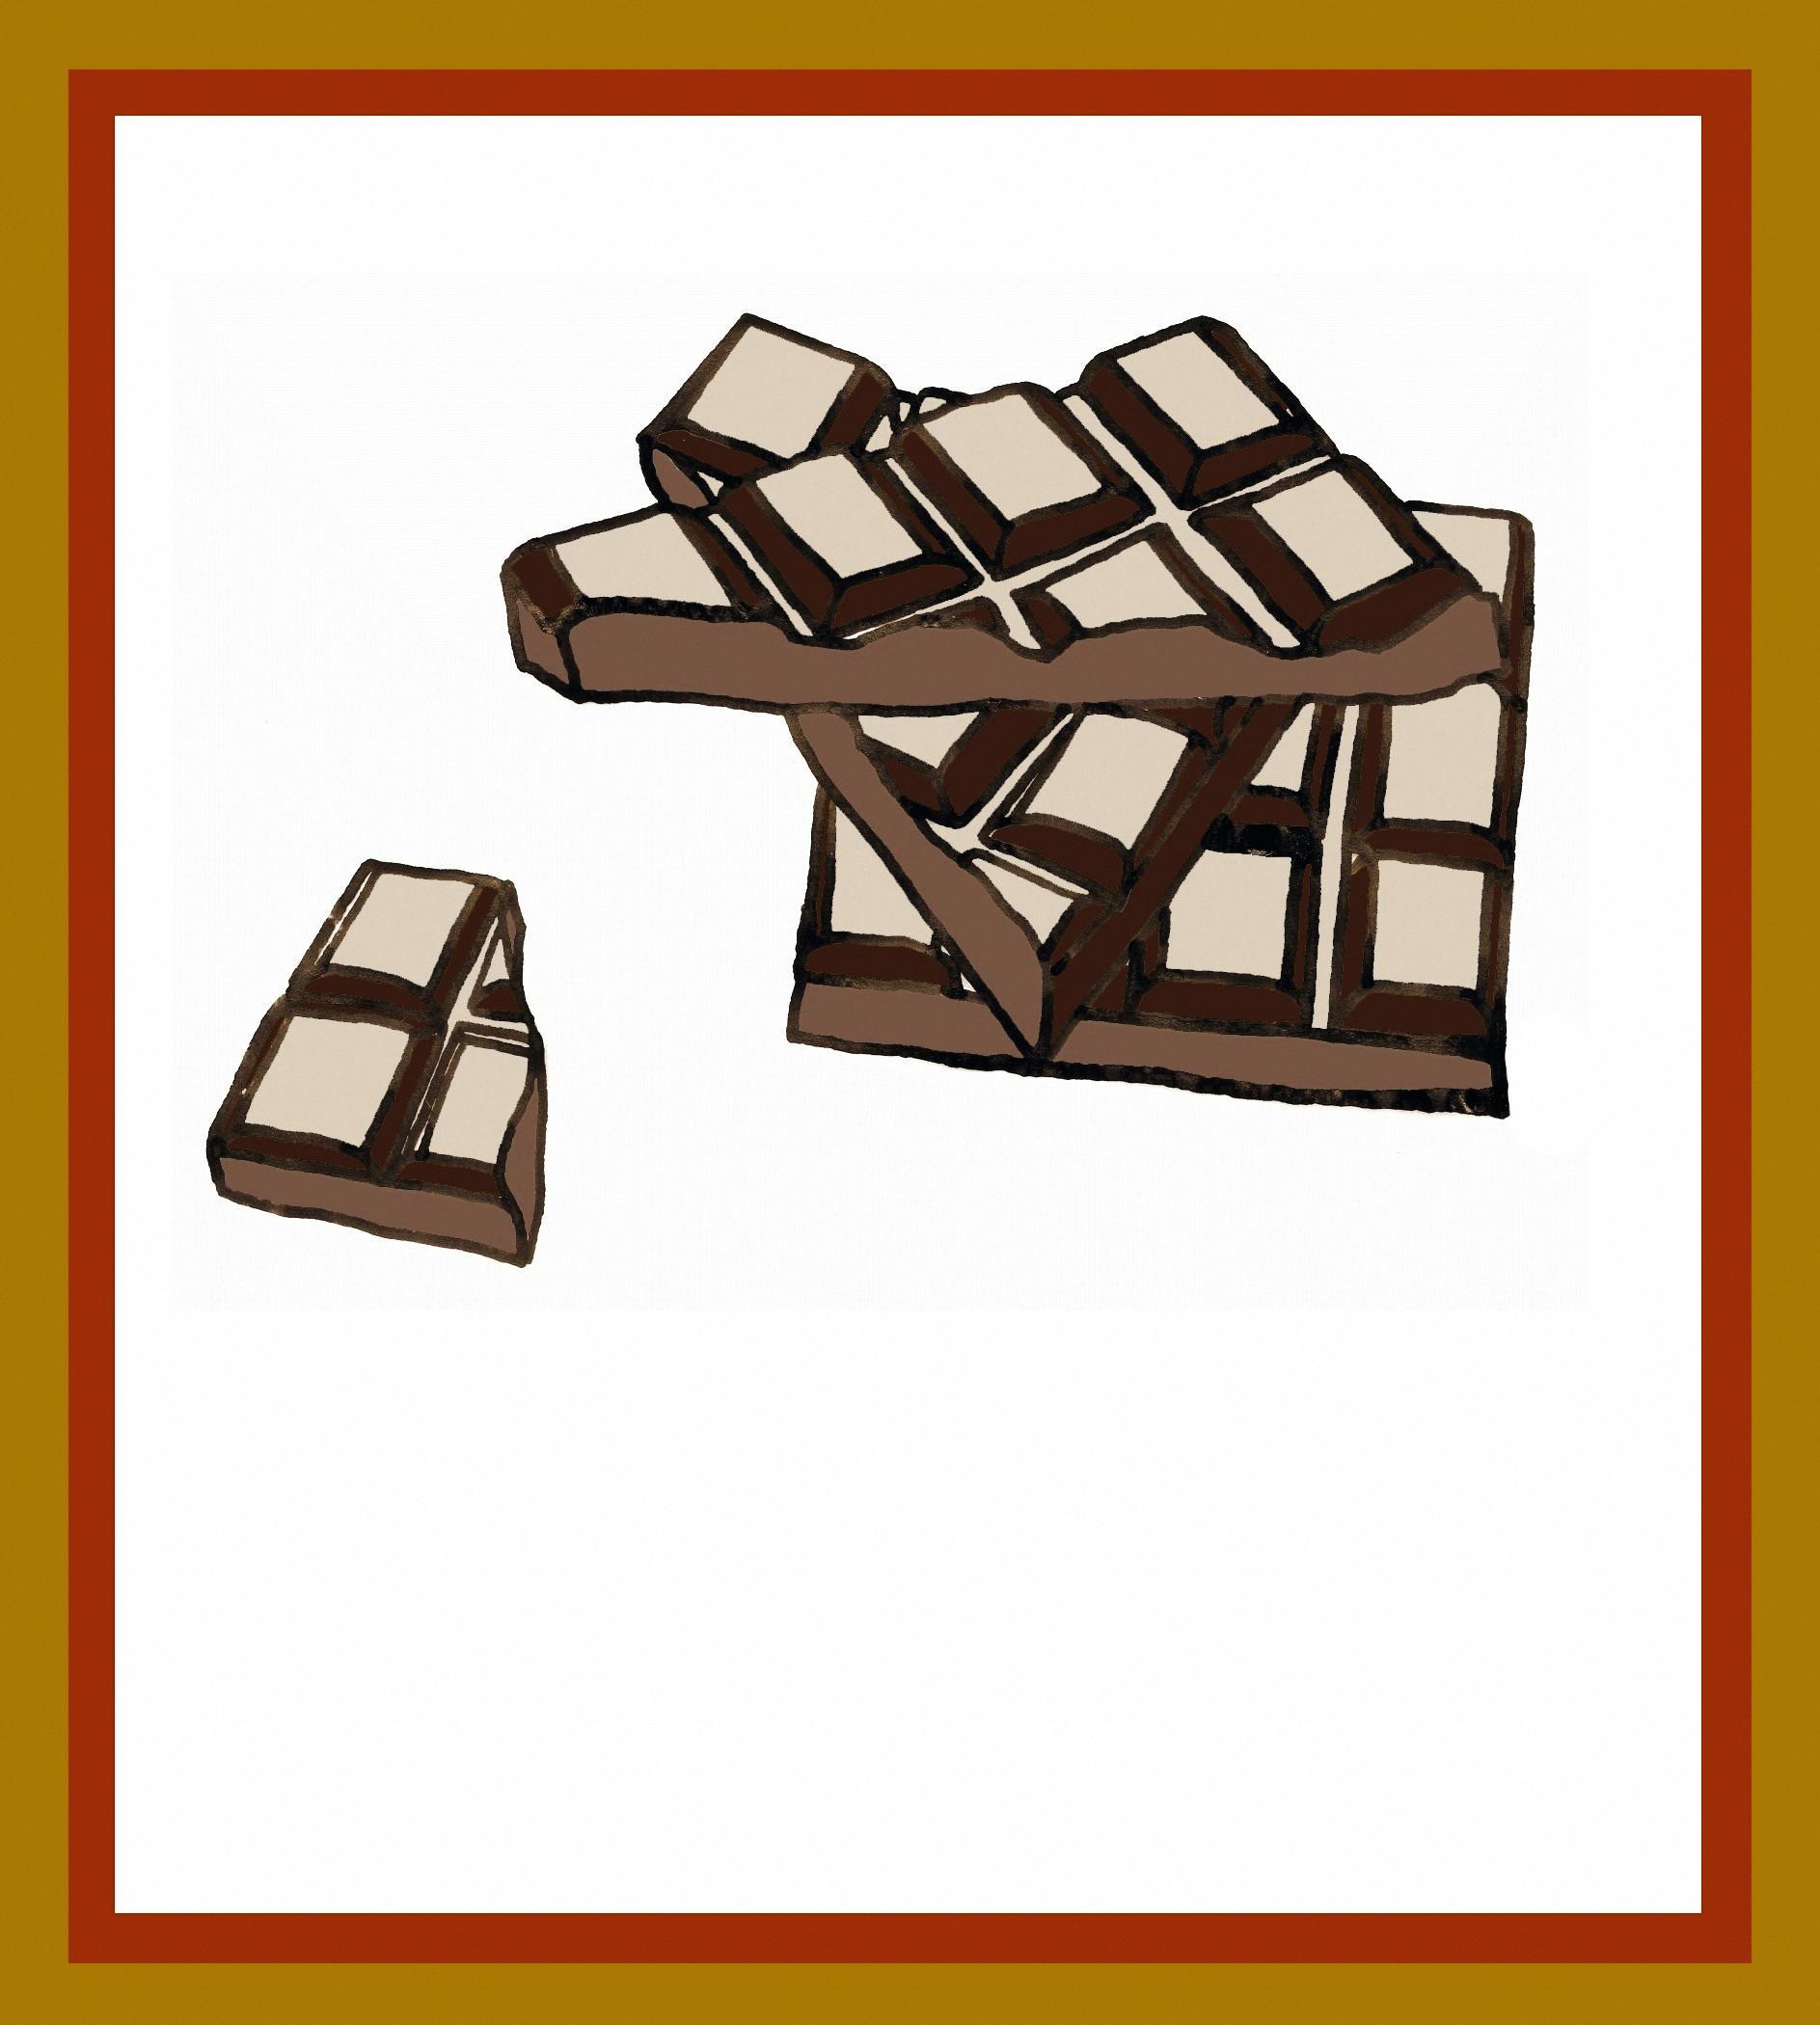 Chocolat, Henry John, 2009.